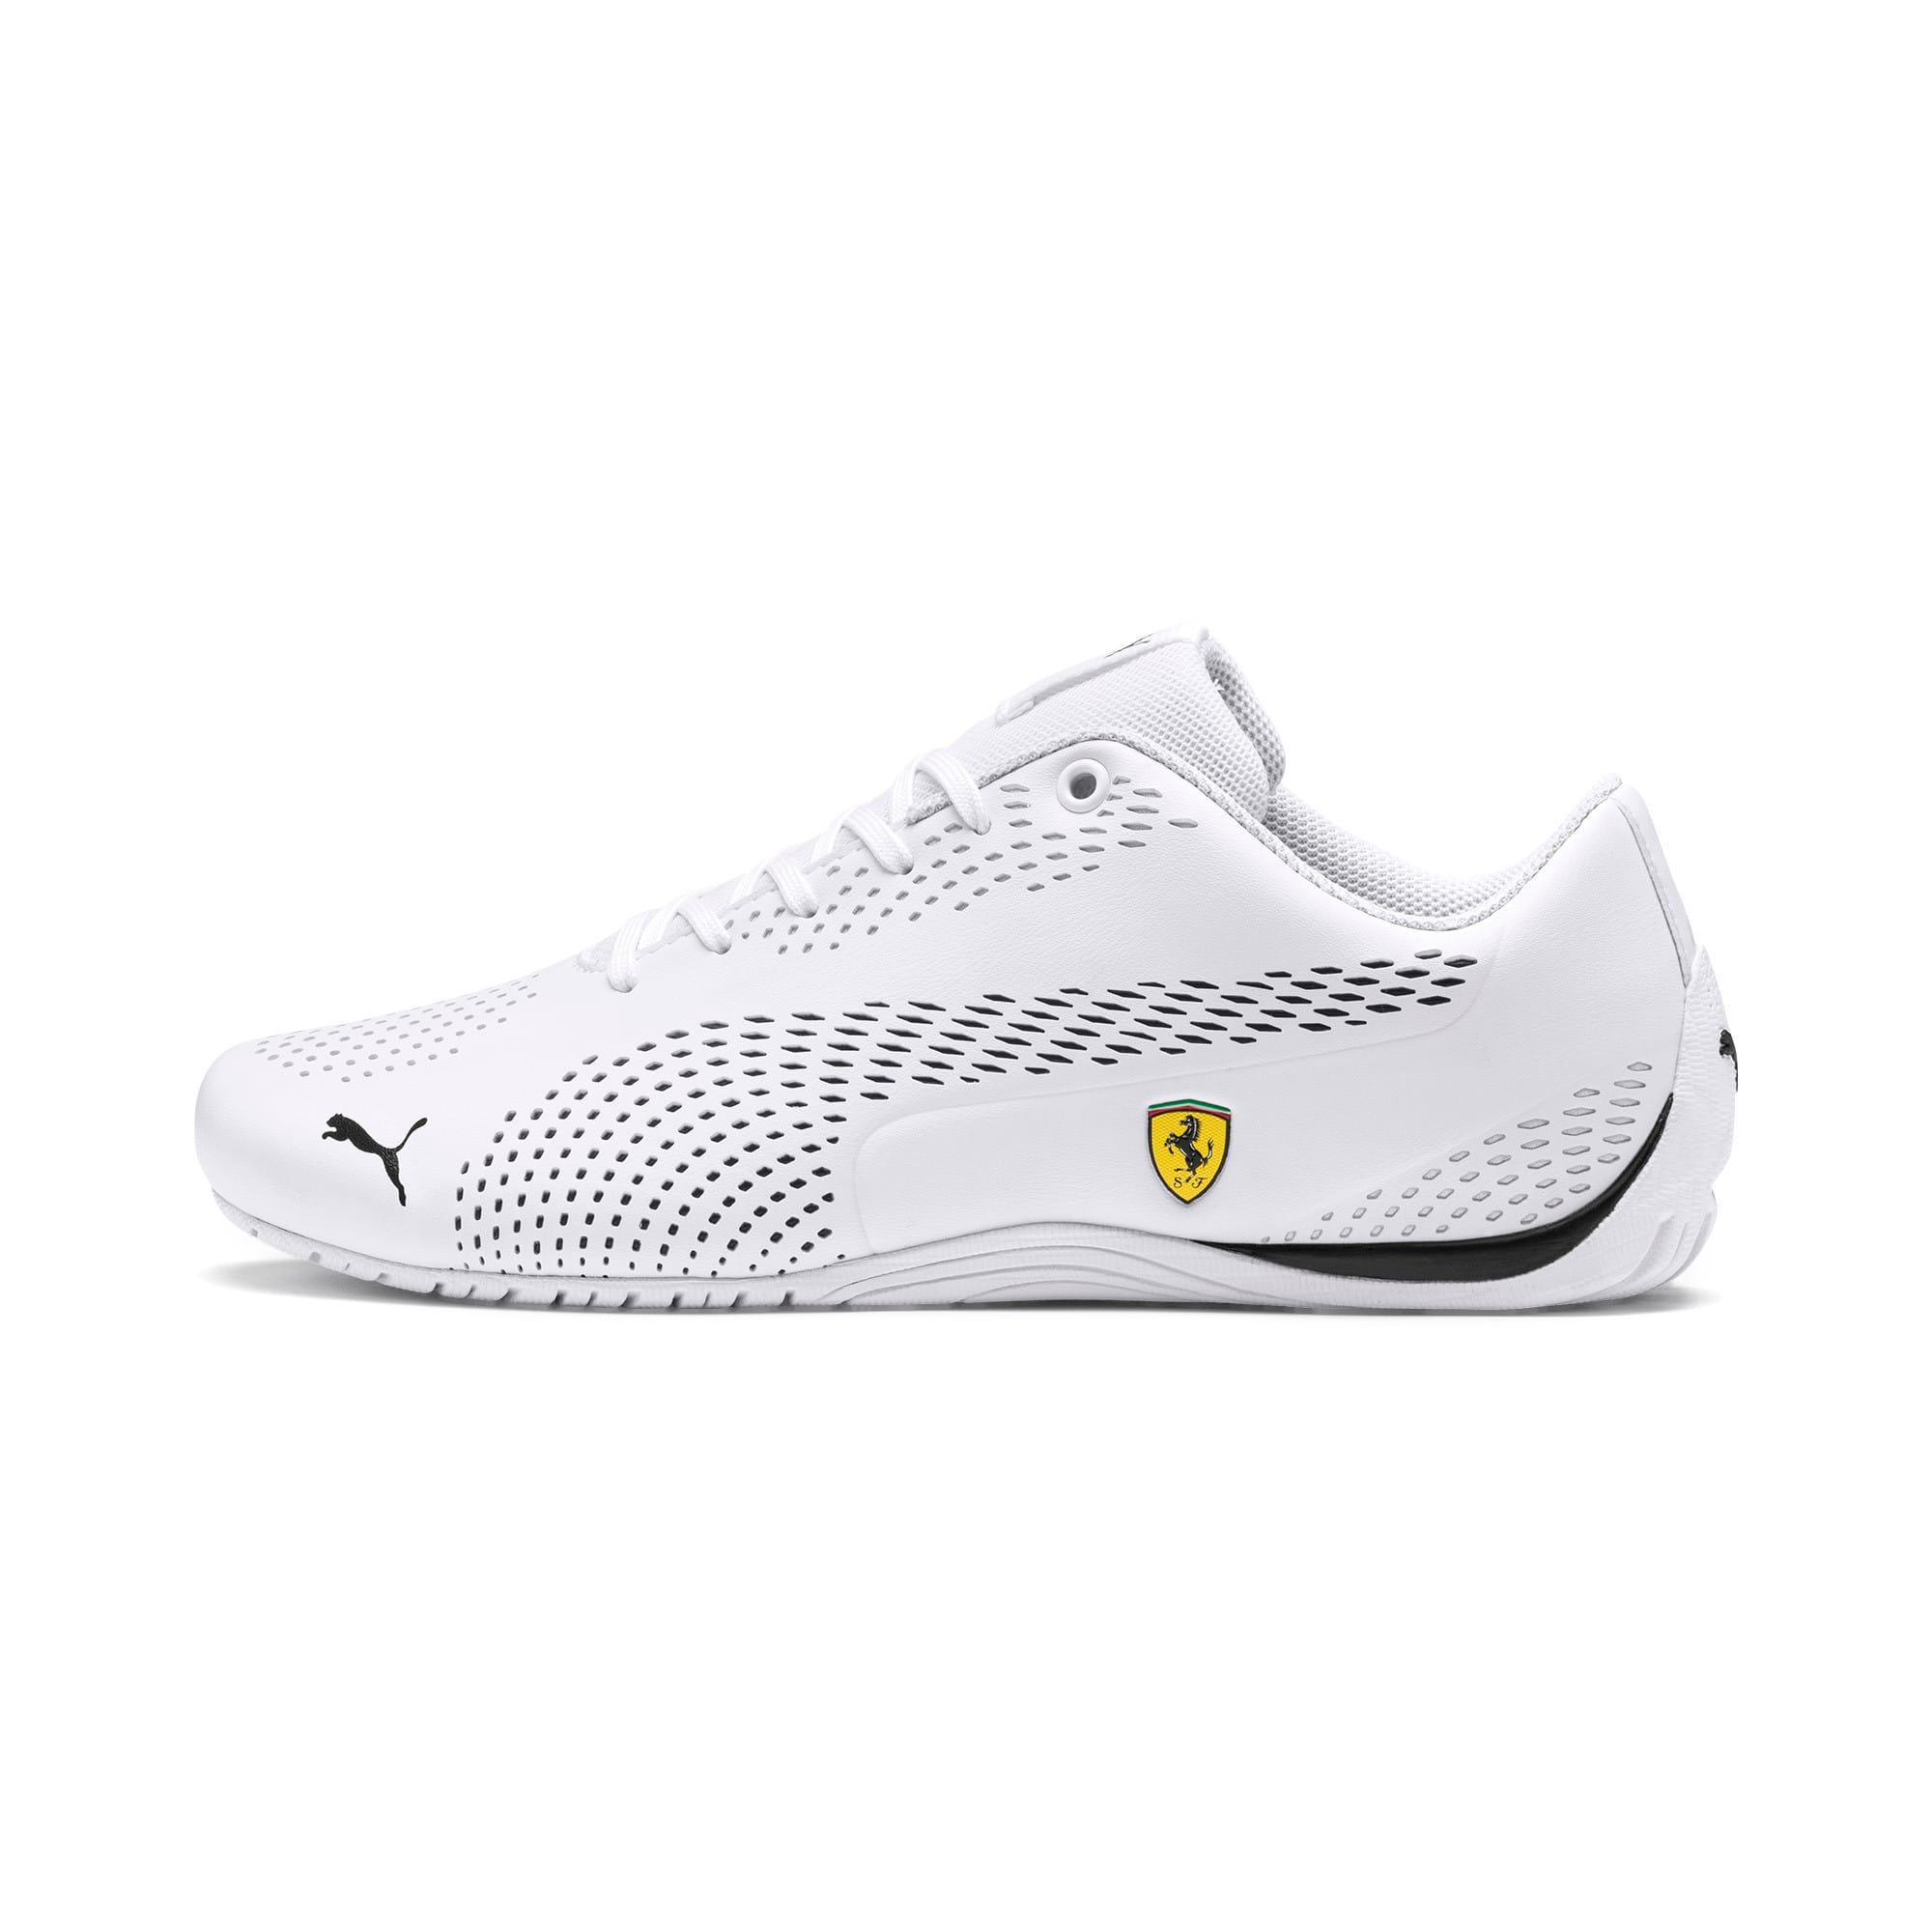 Thumbnail 1 of Scuderia Ferrari Drift Cat 5 Ultra II Shoes, Puma White-Puma Black, medium